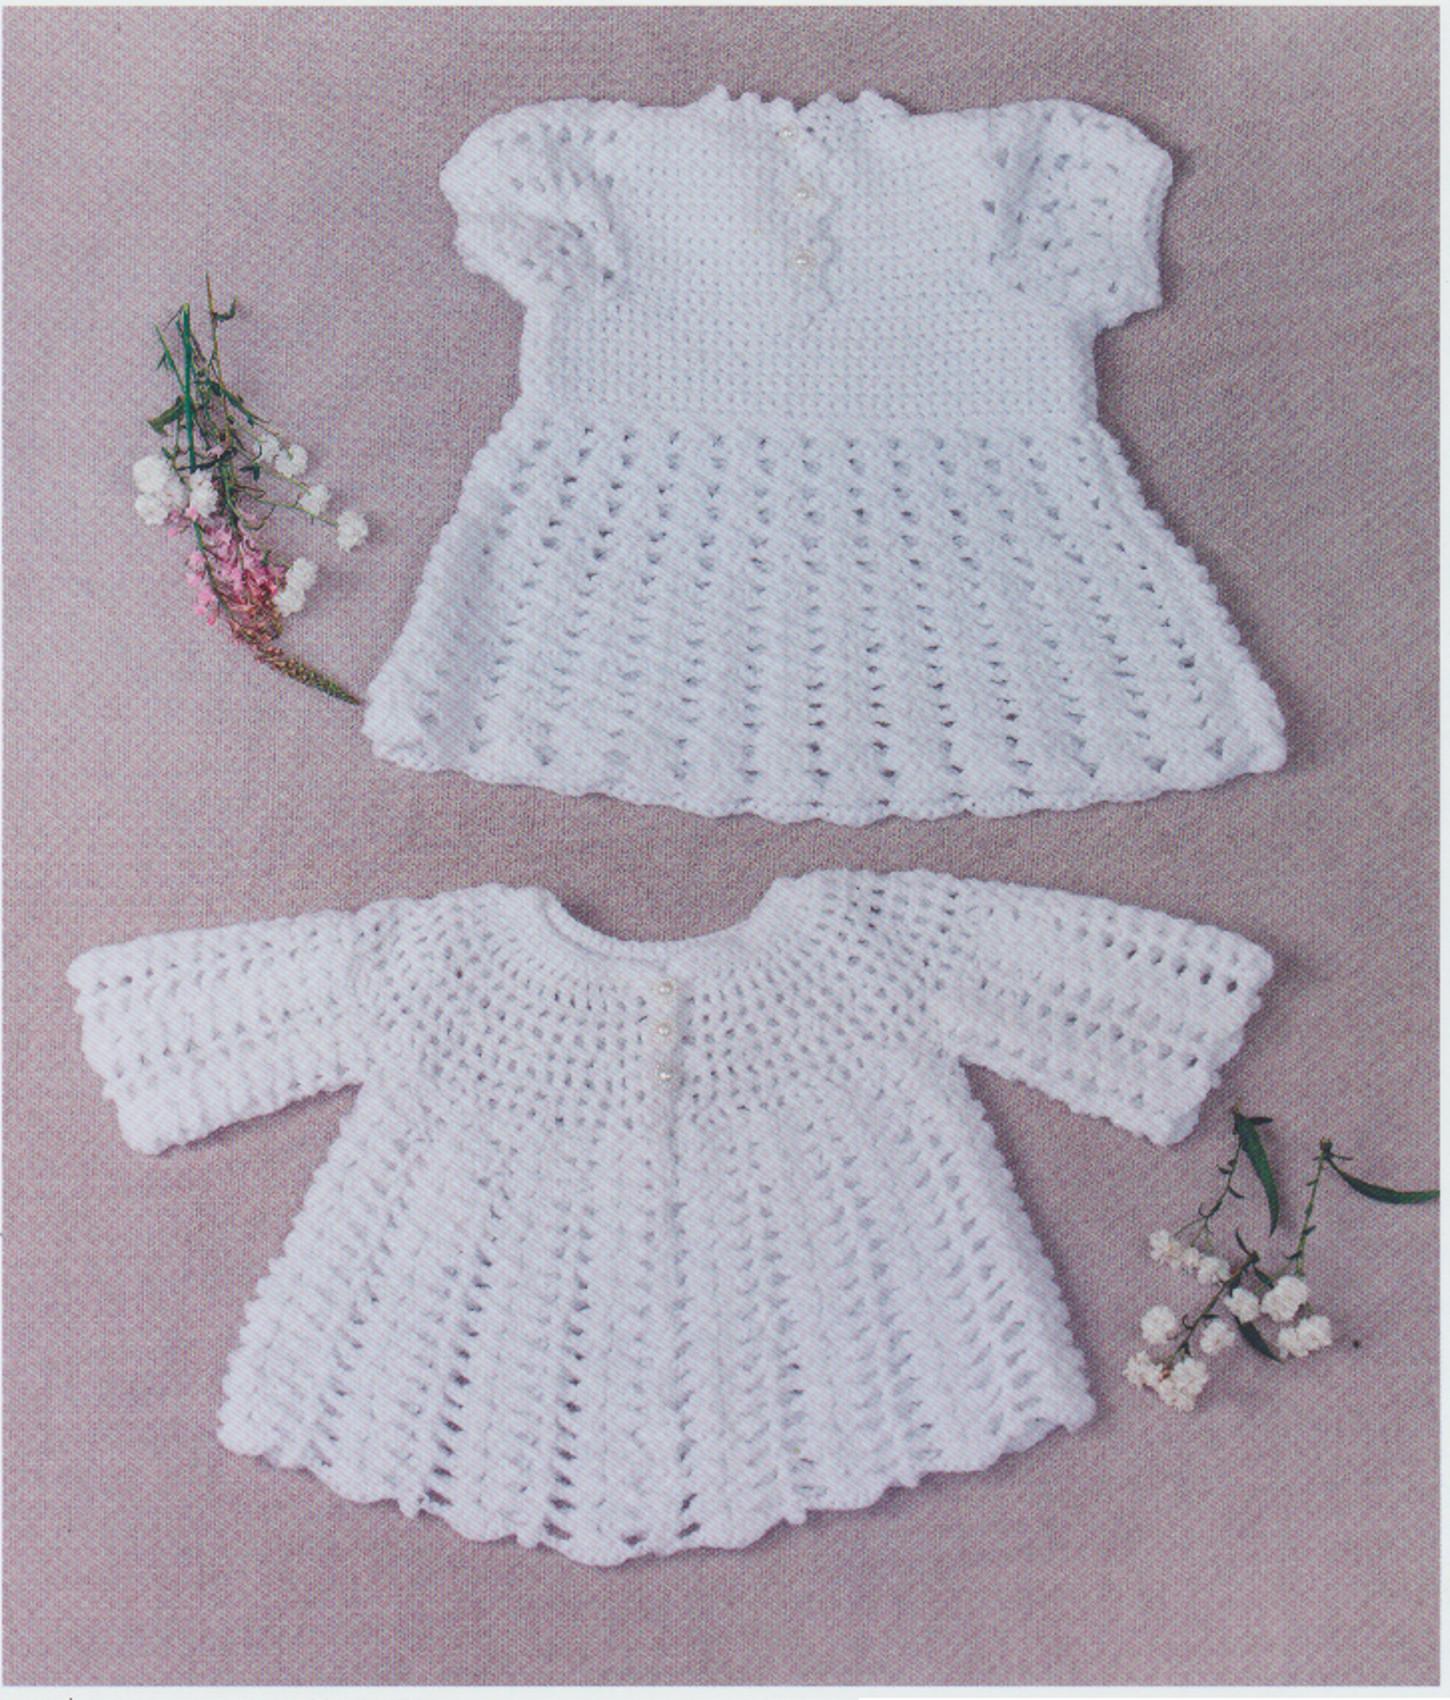 Double Knit Crochet Pattern For Baby Lace Dress Long Sleeve Angel